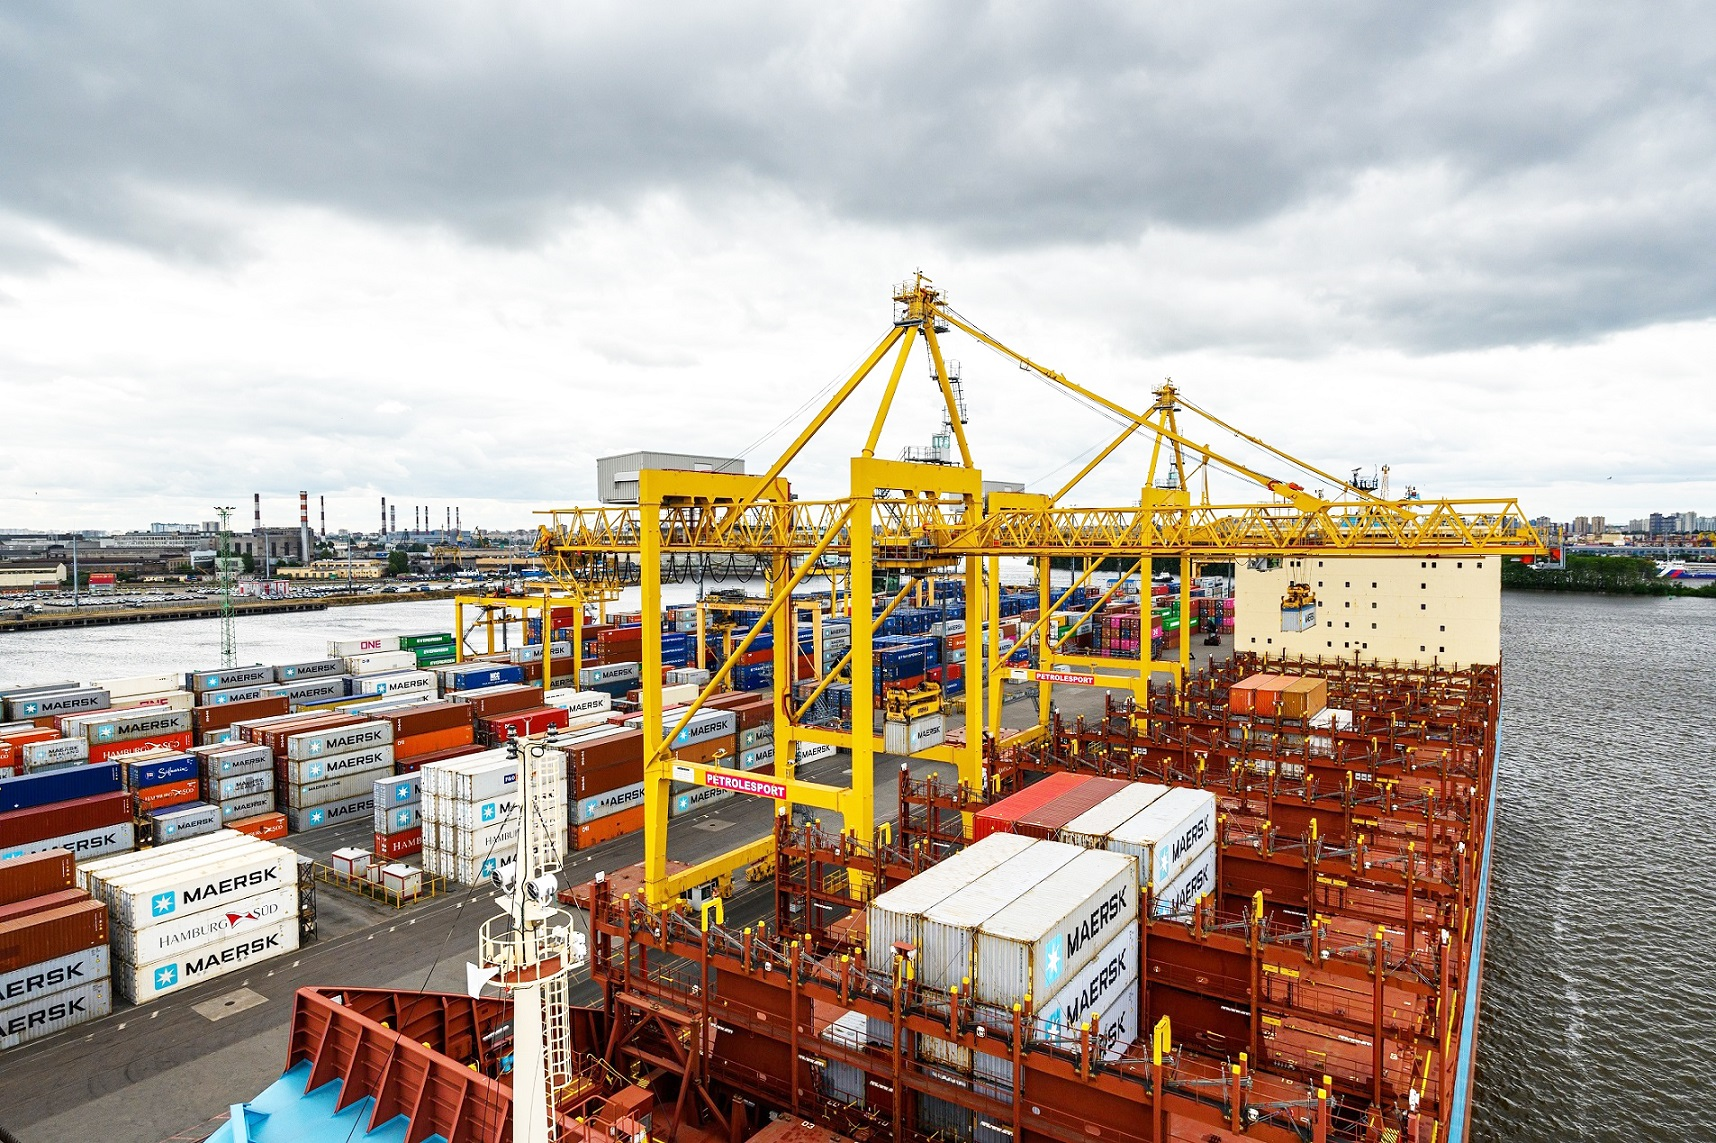 Global Ports installs video surveillance system at PLP